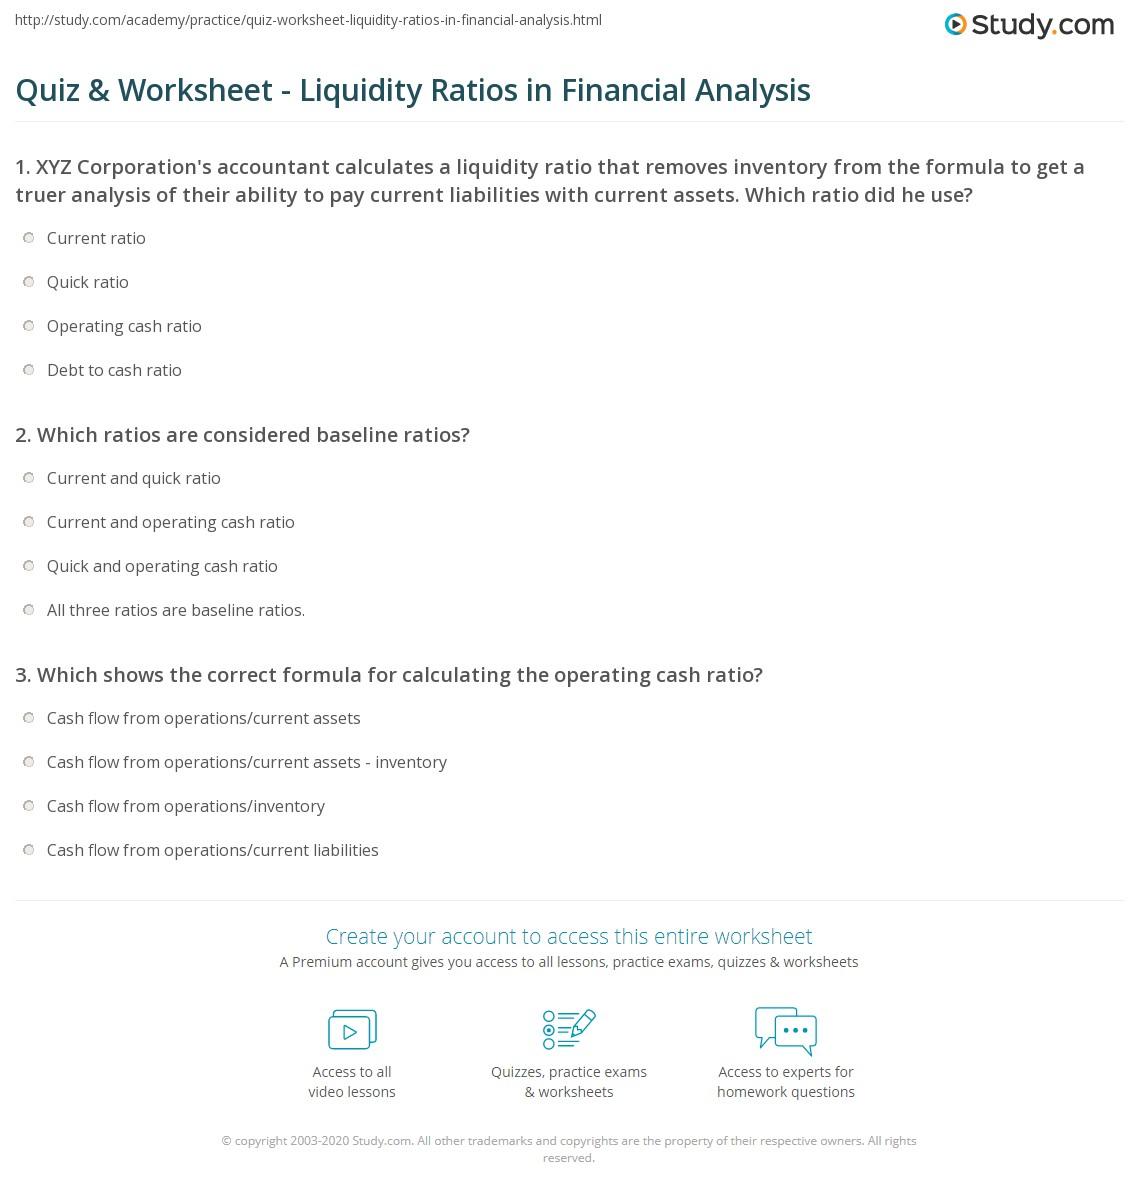 Financial Analysis: Solvency vs. Liquidity Ratios